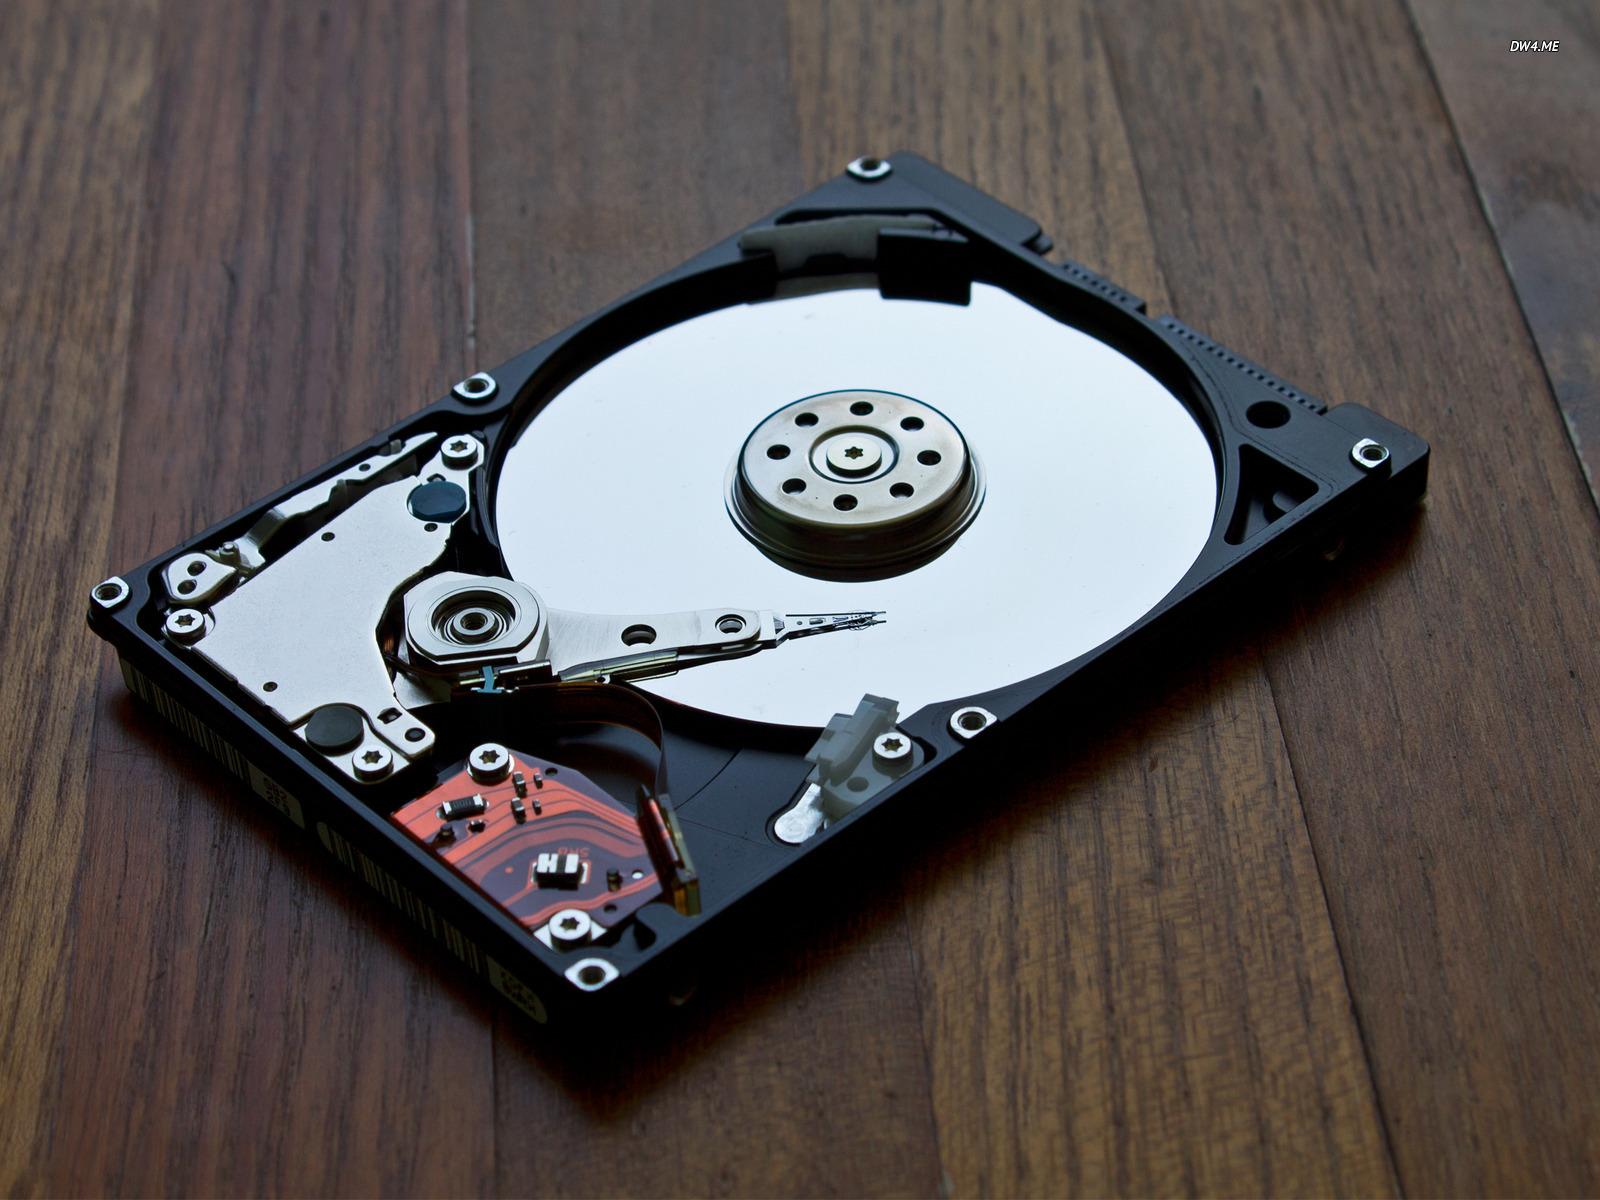 Hard disk drive wallpaper   Computer wallpapers   759 1600x1200